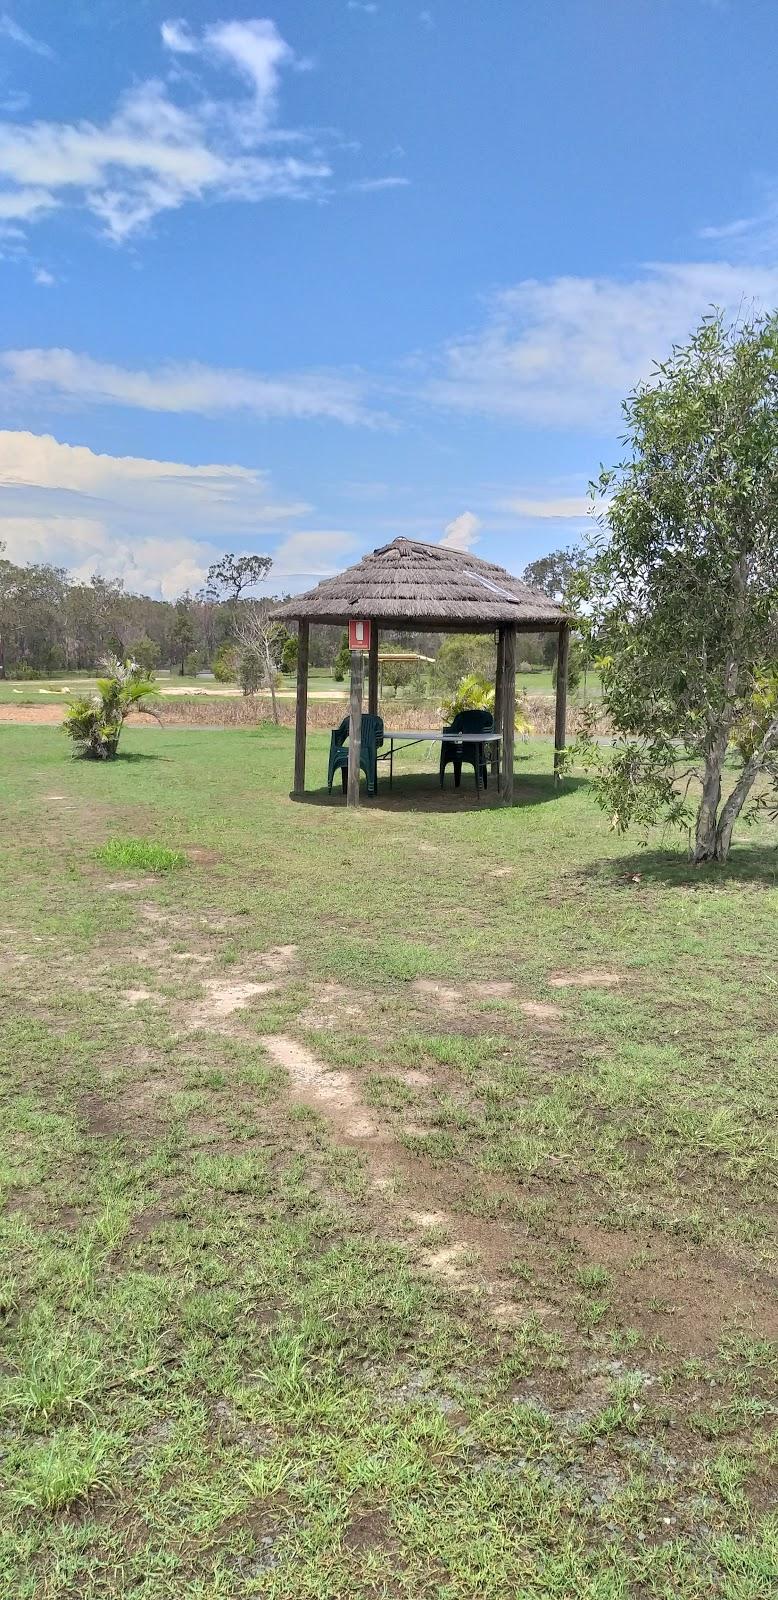 Trinity Islands Holiday Park | campground | 805 Burrum Heads Rd, Burrum River QLD 4659, Australia | 0416258041 OR +61 416 258 041